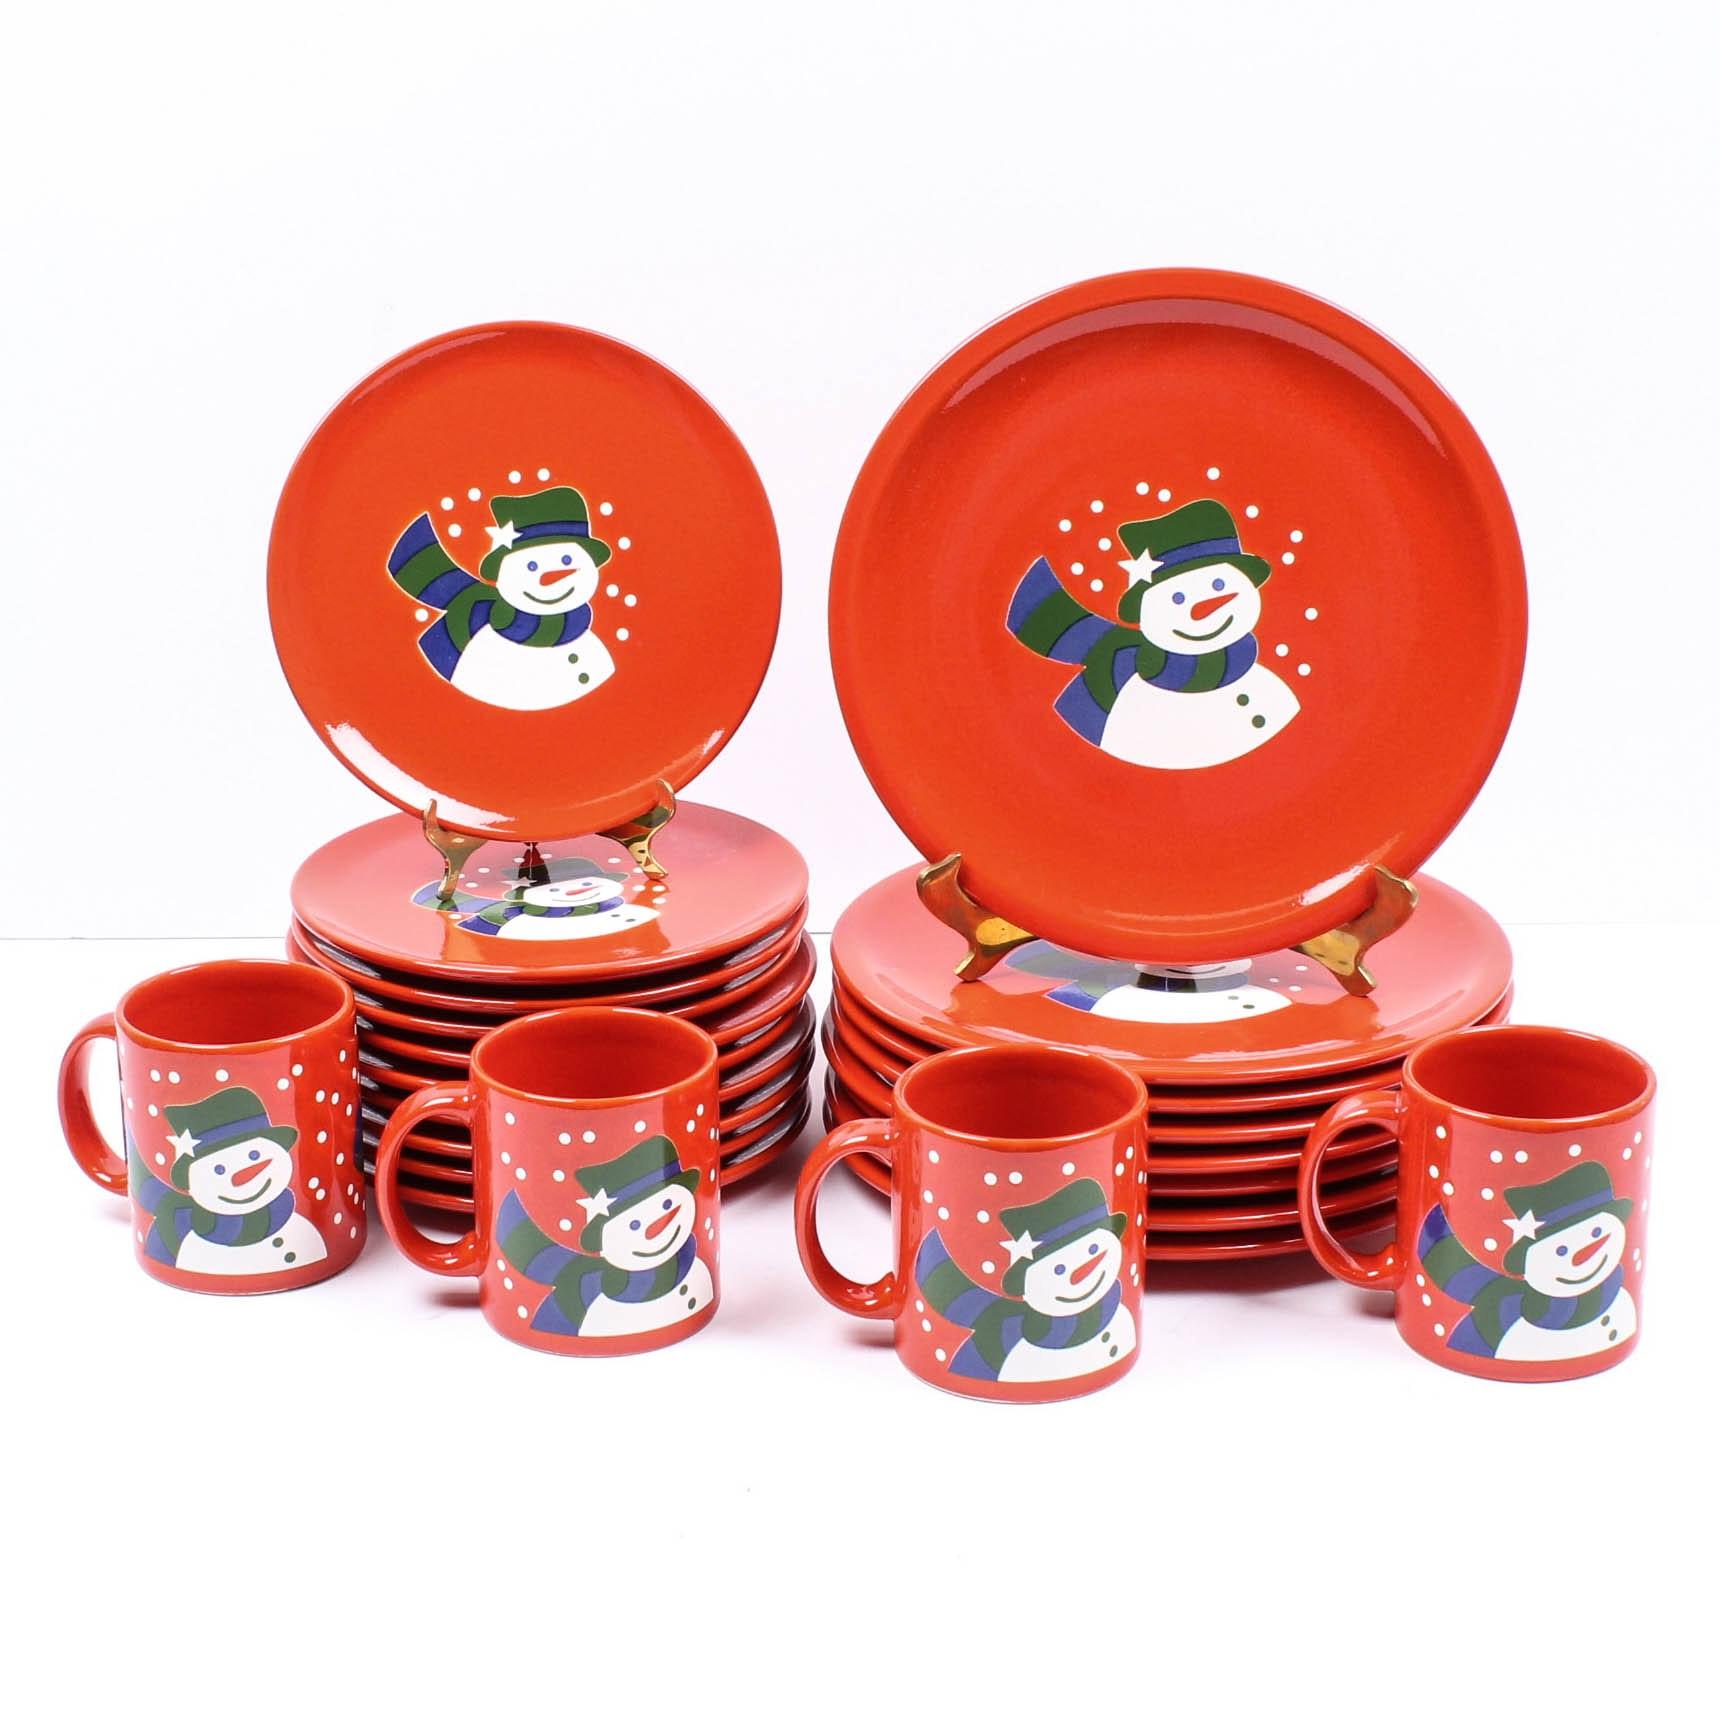 "Waechtersbach German Ceramic Tableware ""Snowman"""